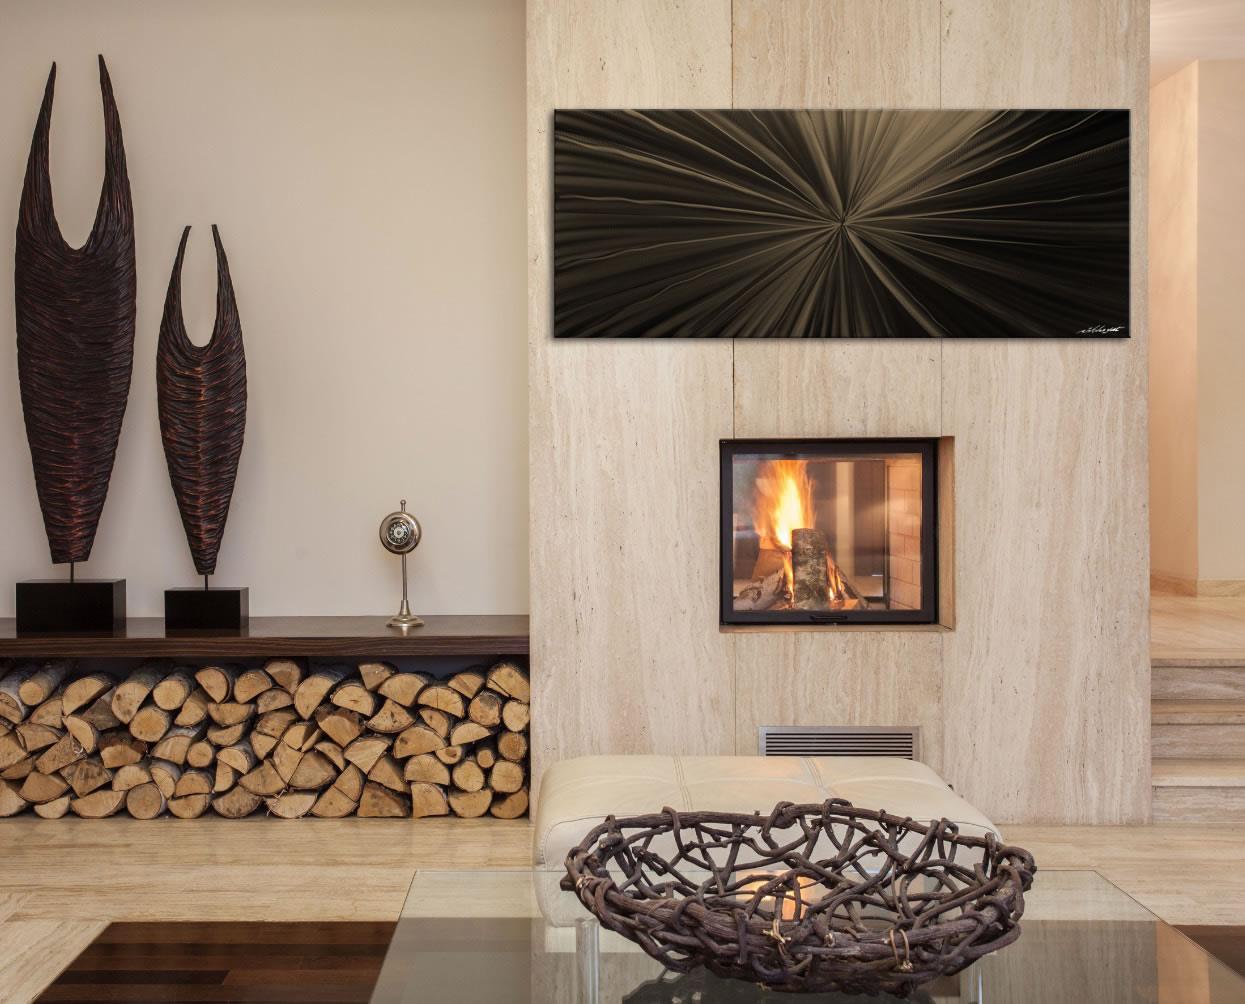 Tantalum Bronze - Contemporary Metal Wall Art - Lifestyle Image